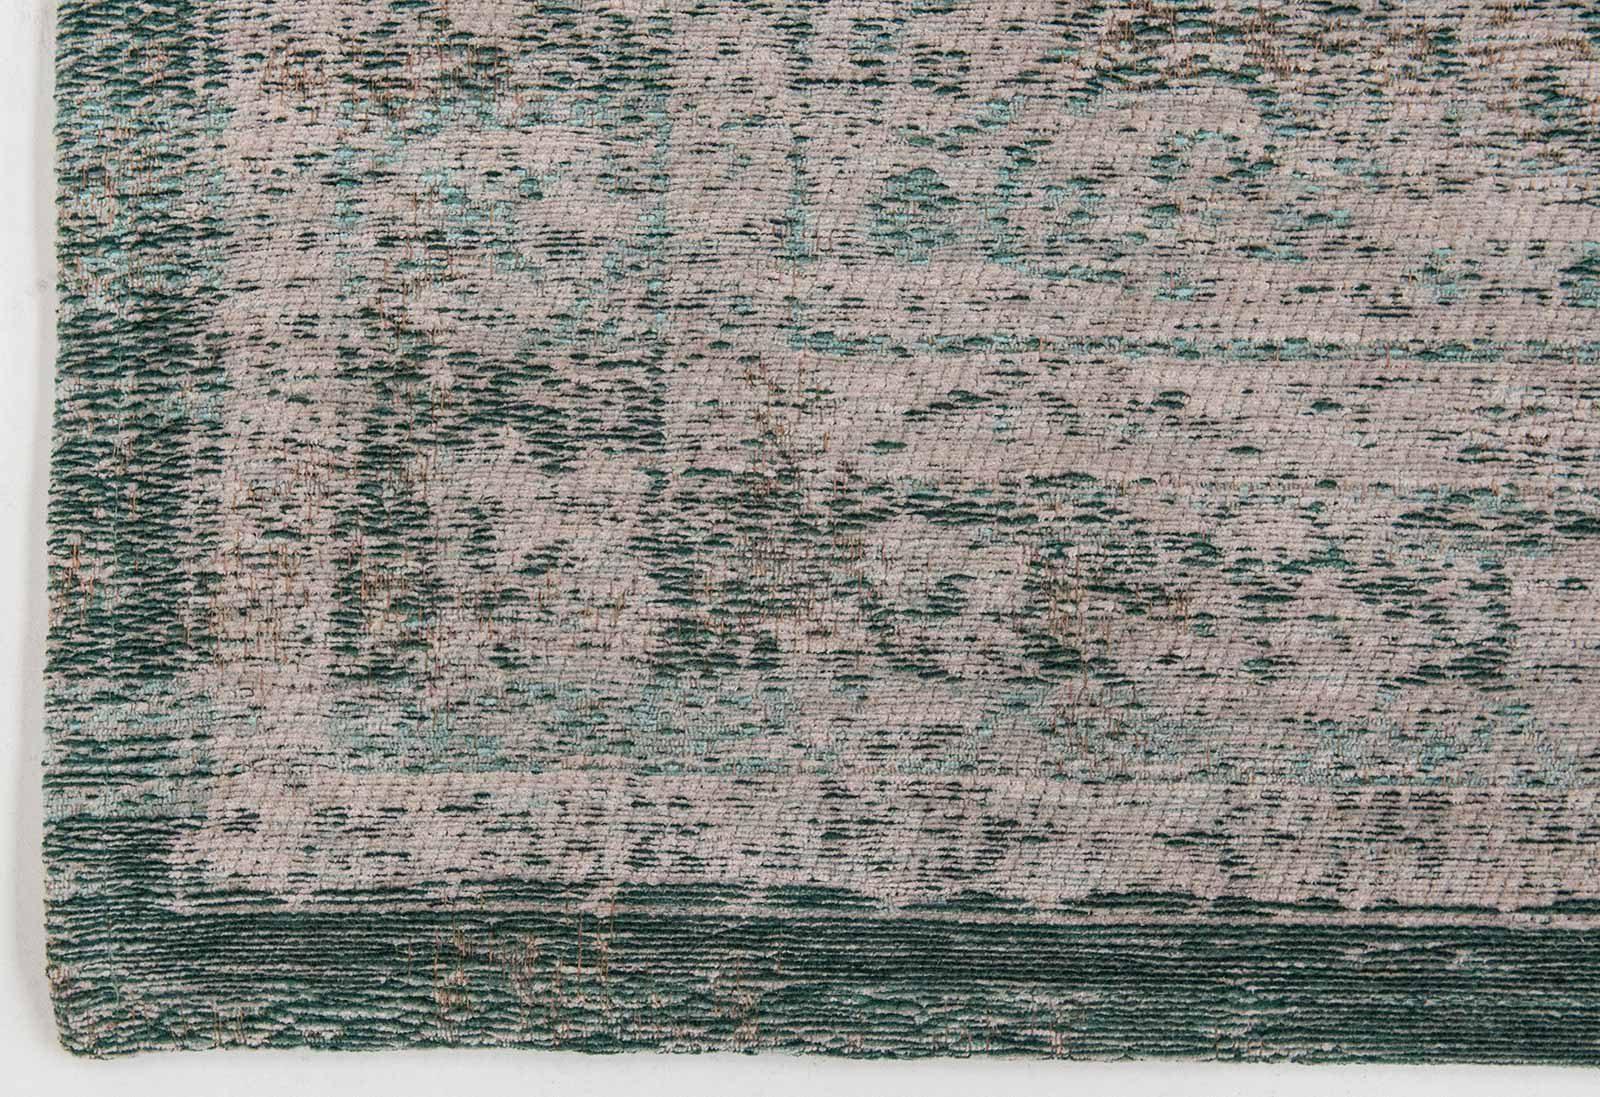 alfombras Louis De Poortere LX8259 Fading World Medaillon Jade Oyster corner